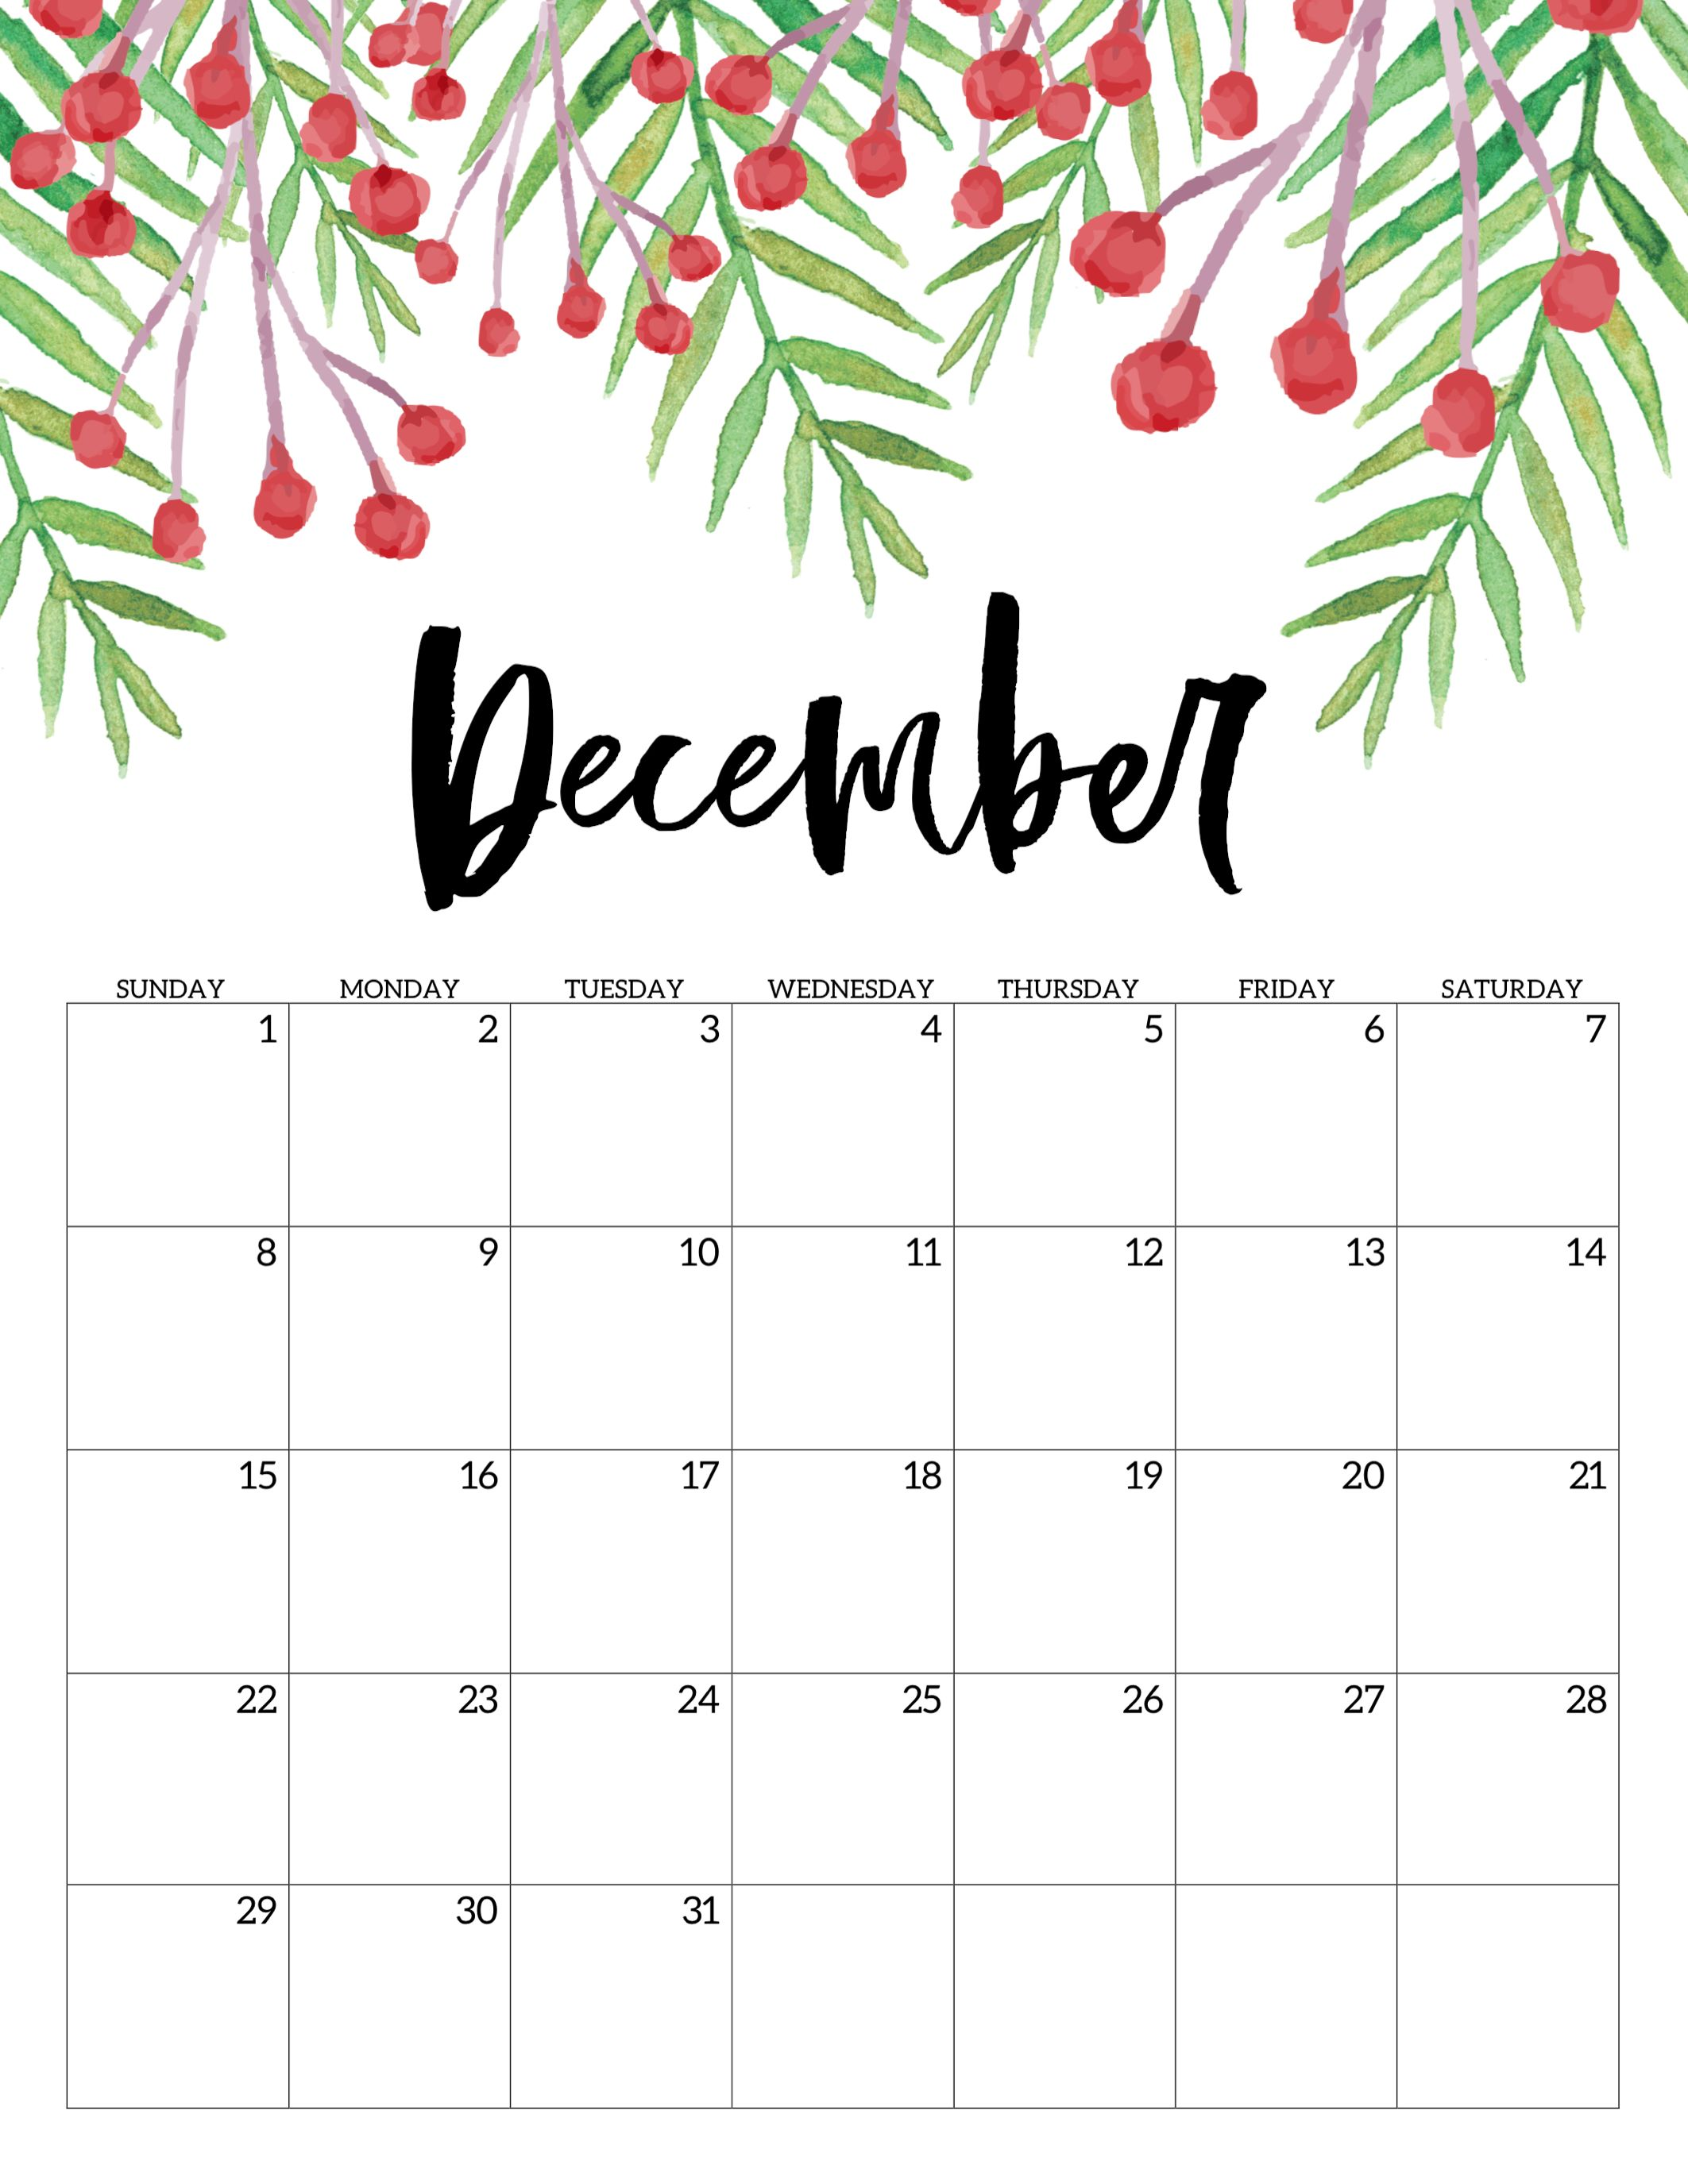 December 2019 Floral Calendar